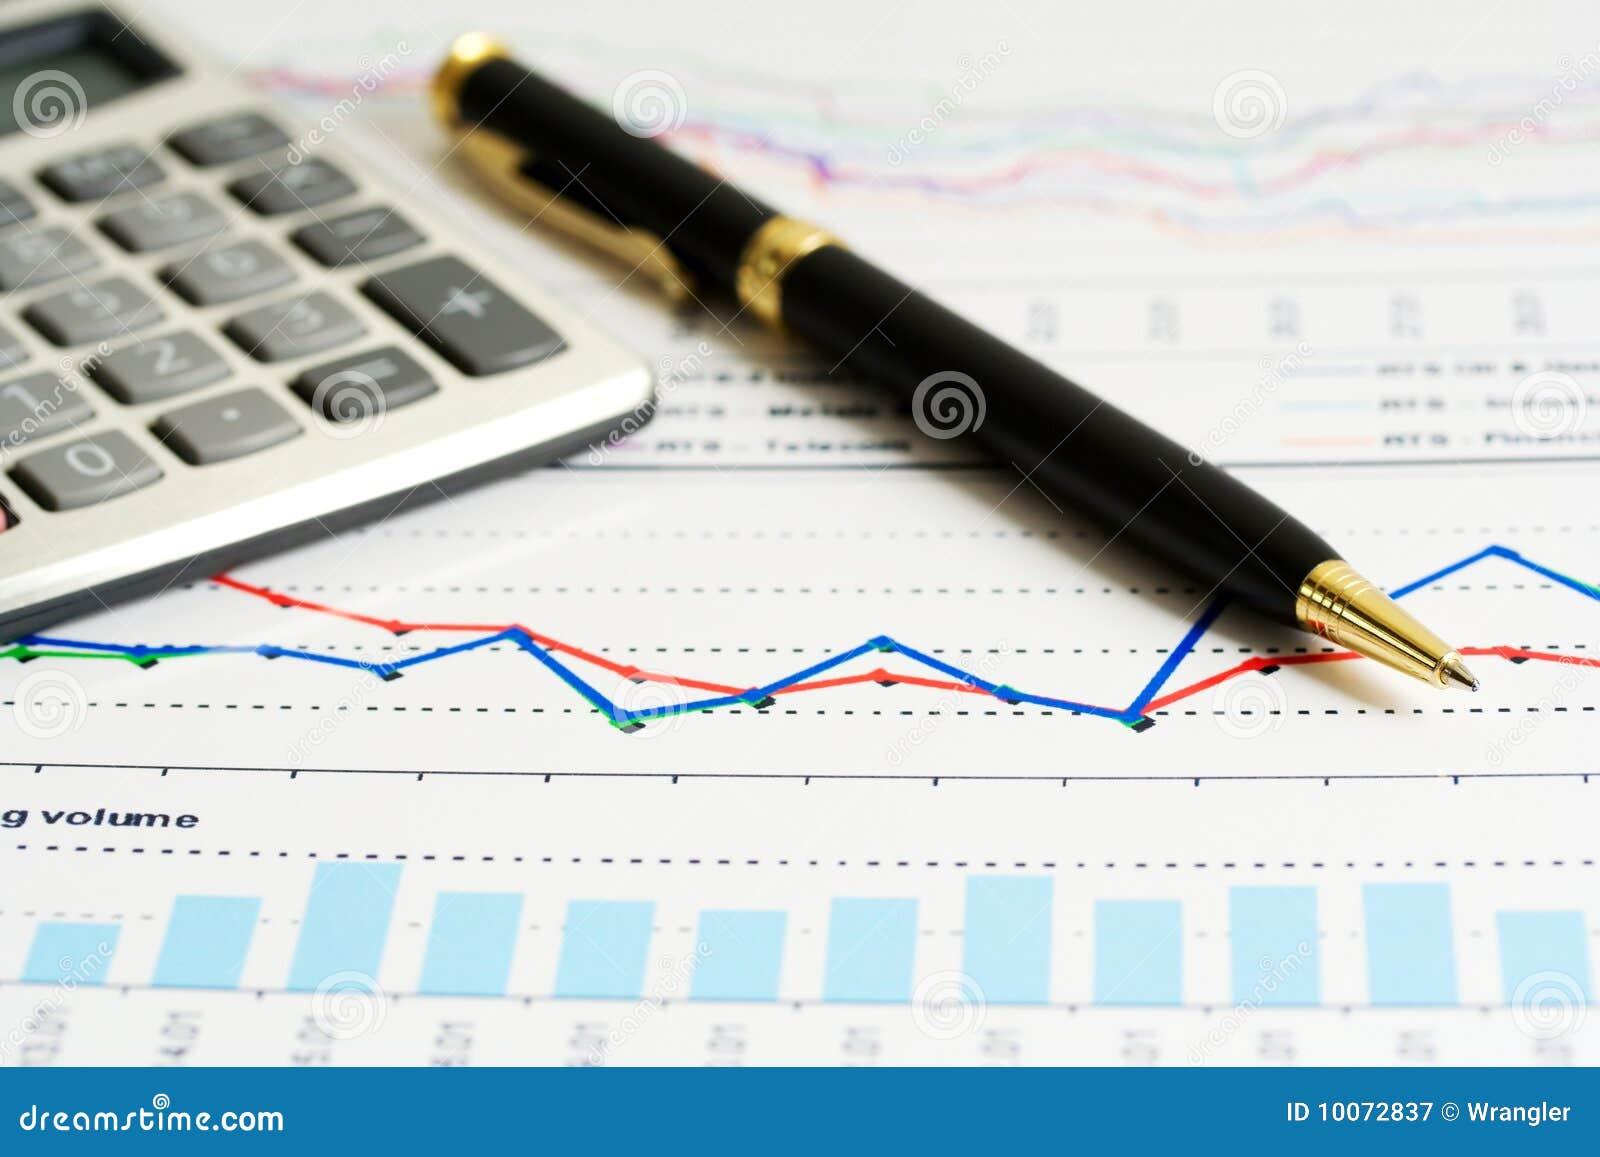 Financial Accounting Market Graphs Analysis Photo – Stock Market Analysis